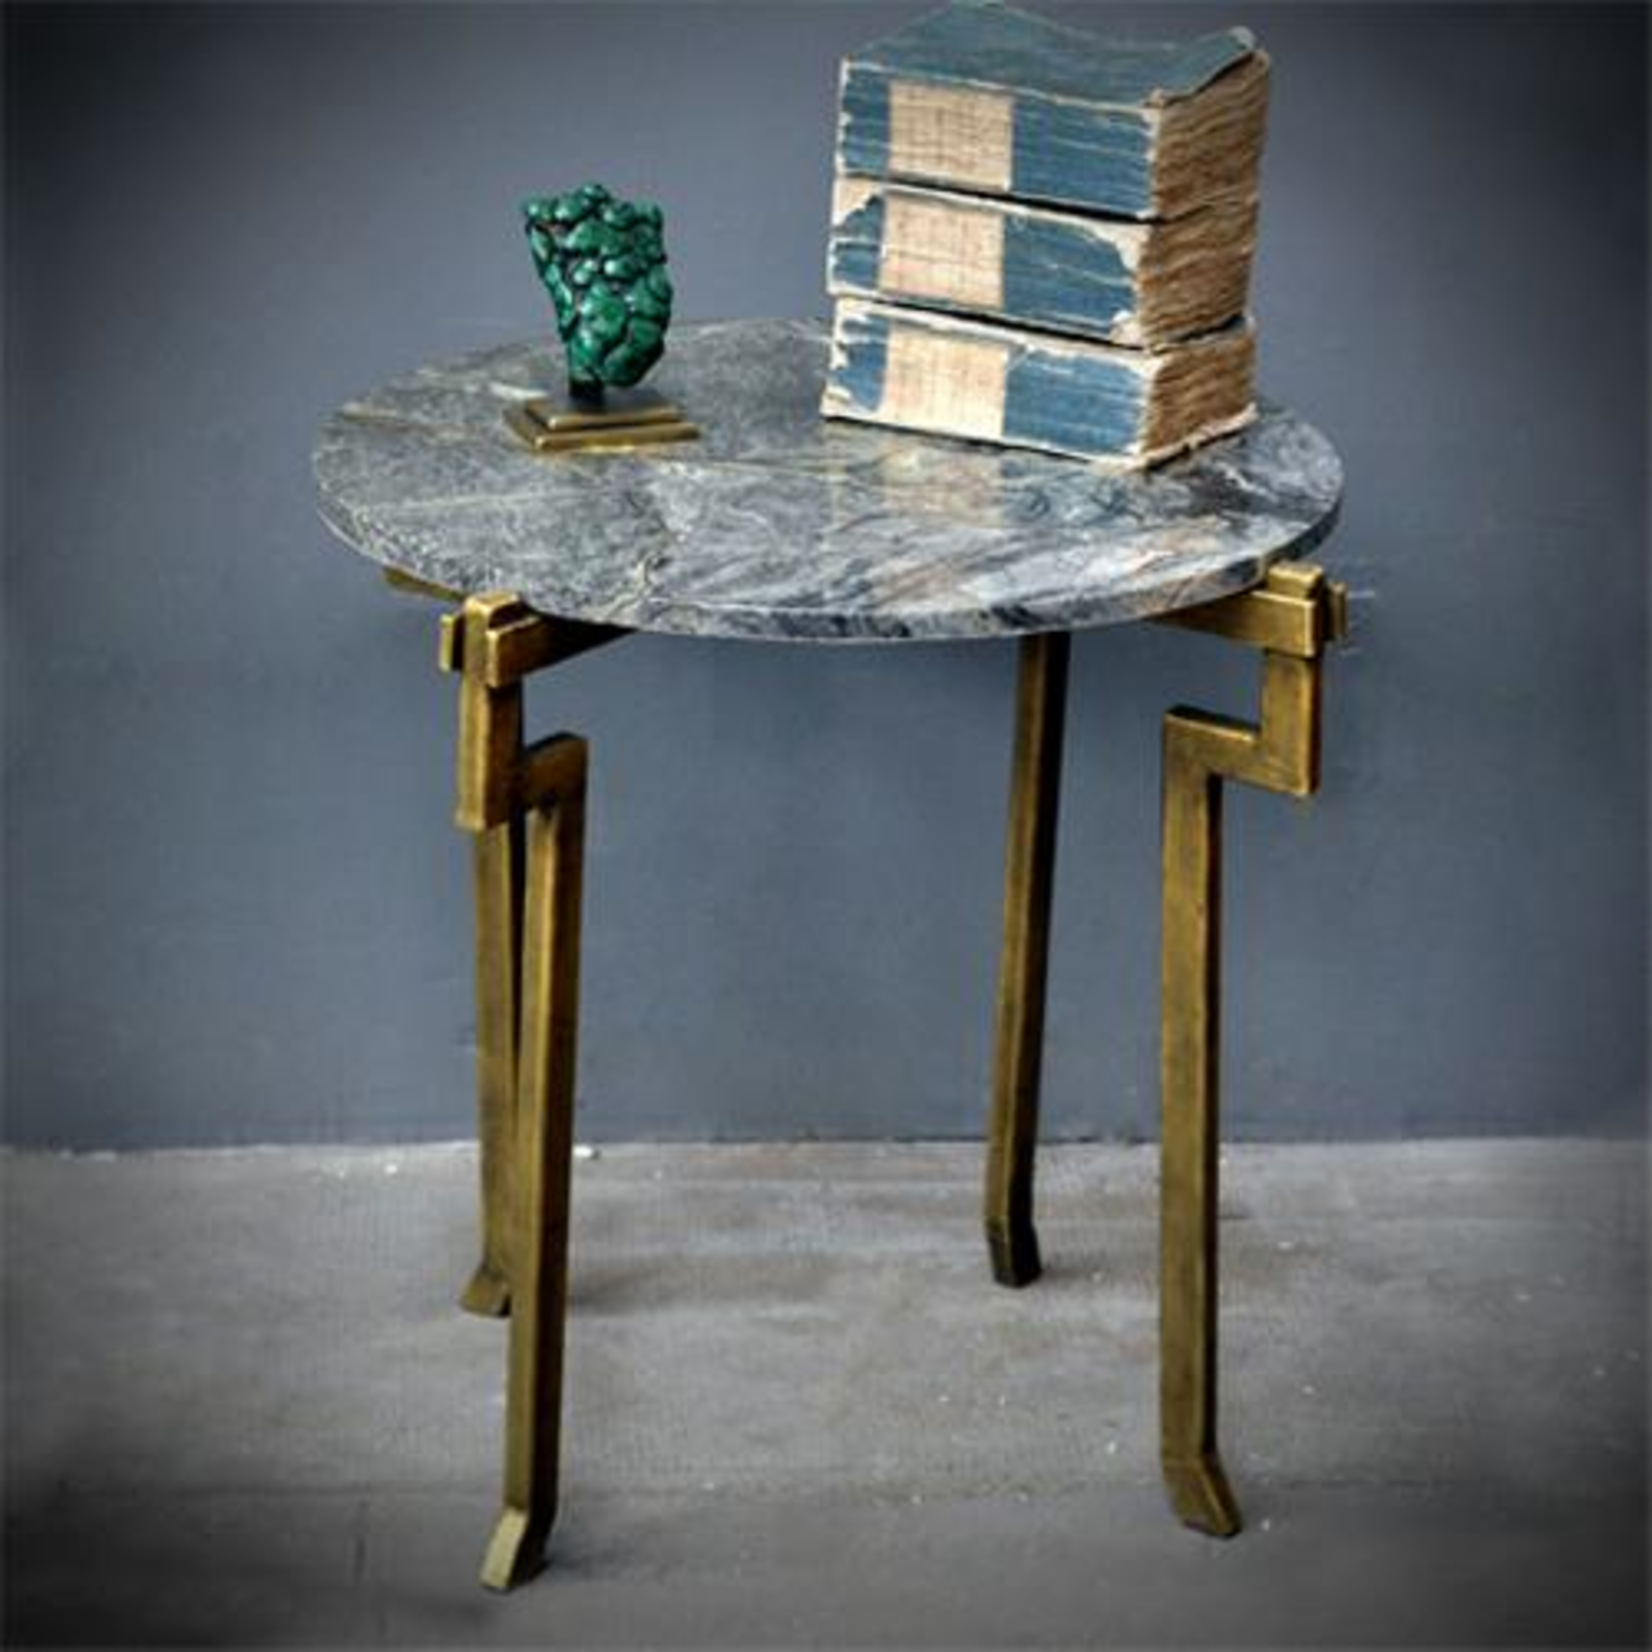 OBJET DE CURIOSITE  GREEN MARBLE TOP & GOLDEN IRON BADE TABLE